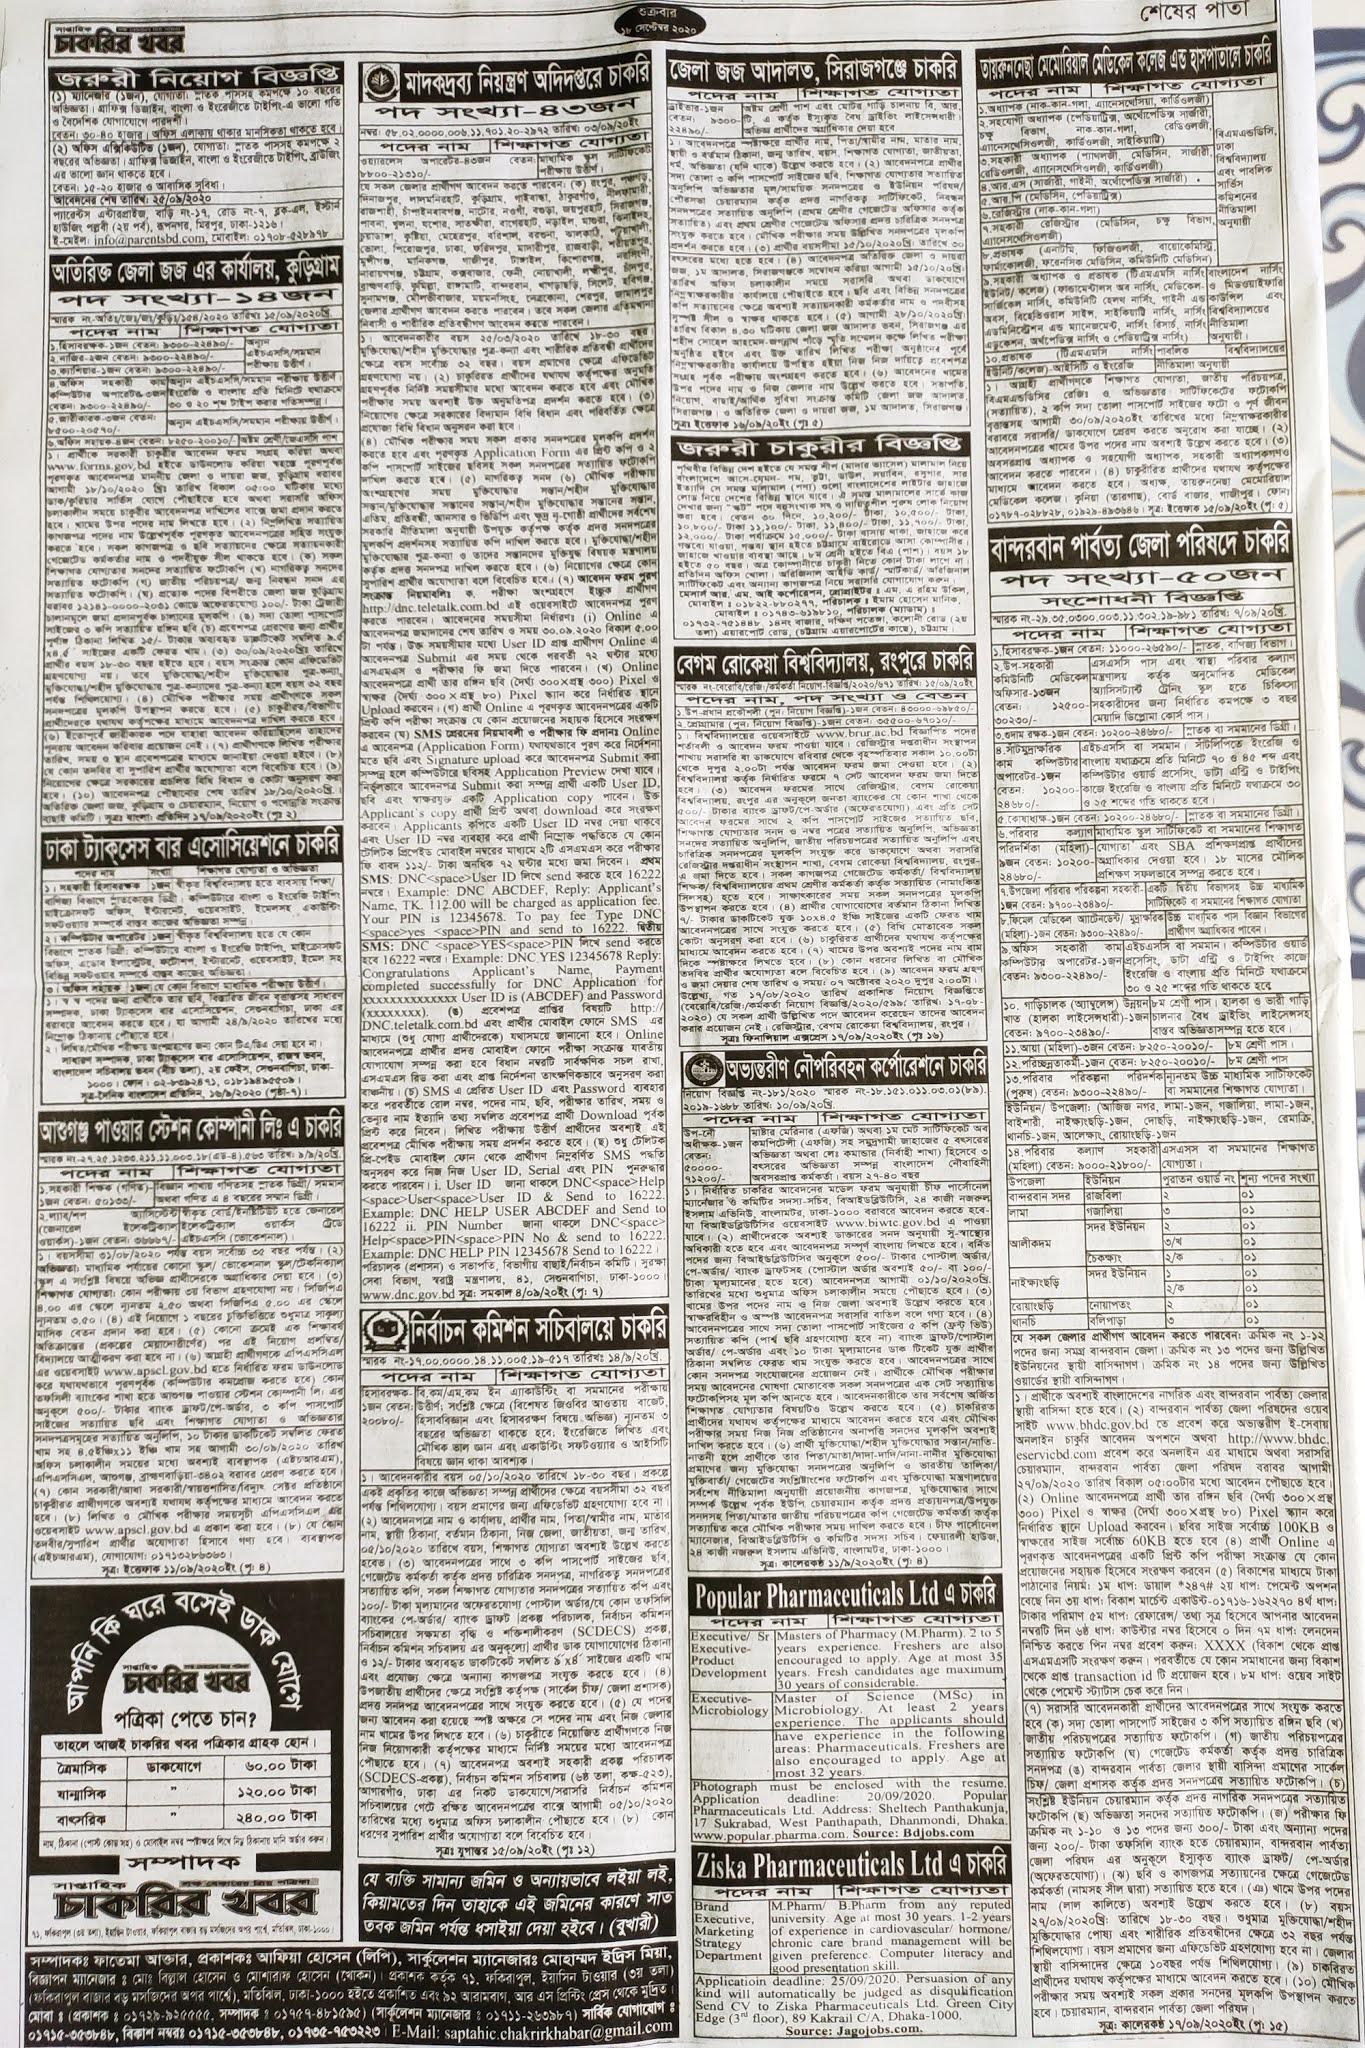 Saptahik Chakrir Khobor Newspaper 18 September 2020 - সাপ্তাহিক চাকরির খবর পত্রিকা ১৮ সেপ্টেম্বর ২০২০ - Saptahik Chakrir Khobor 18 September 2020